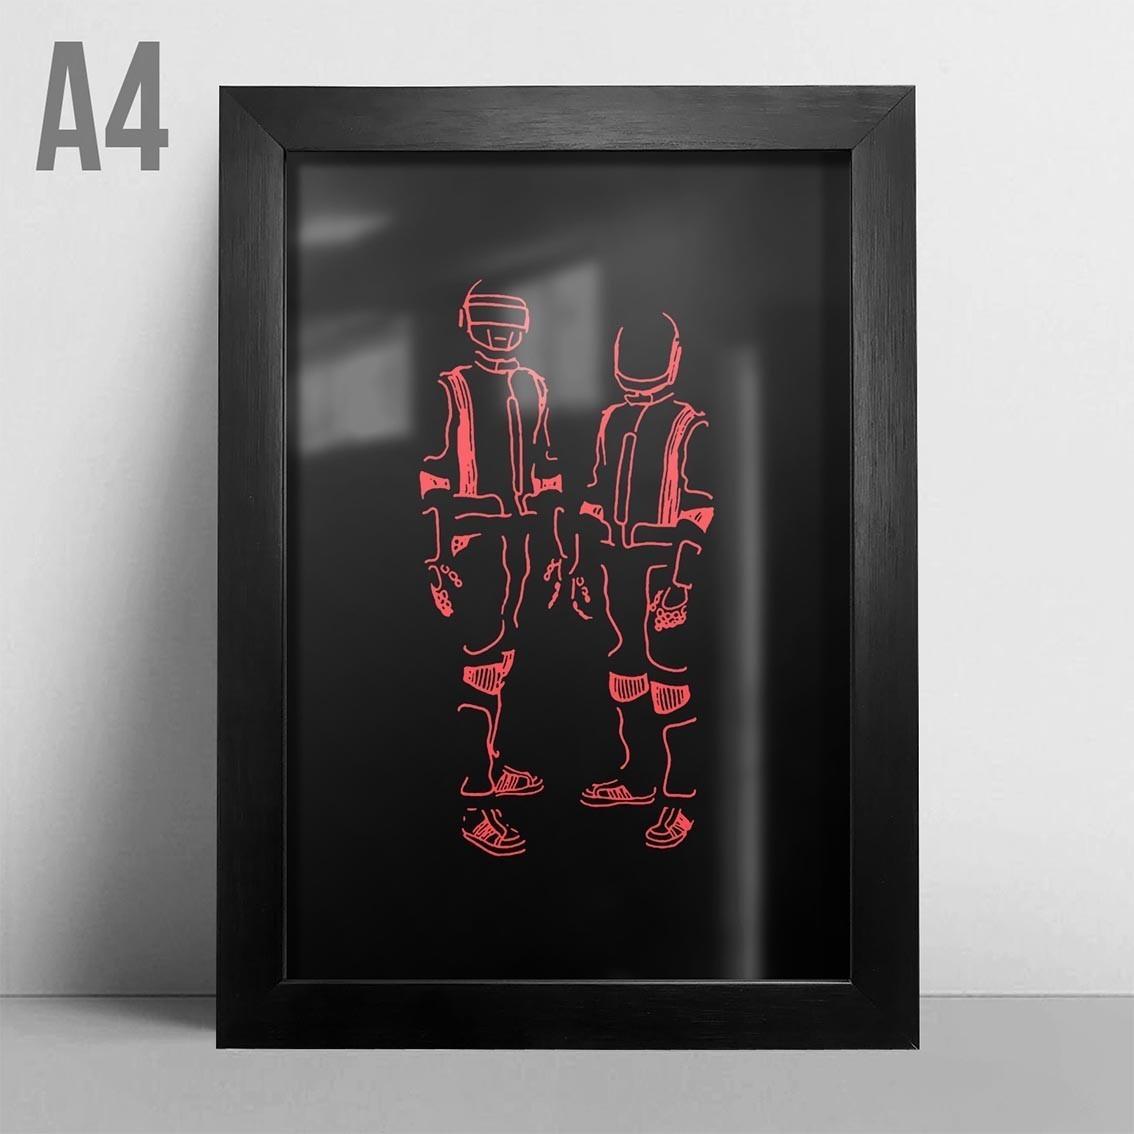 Quadro A4 - Daft Punk